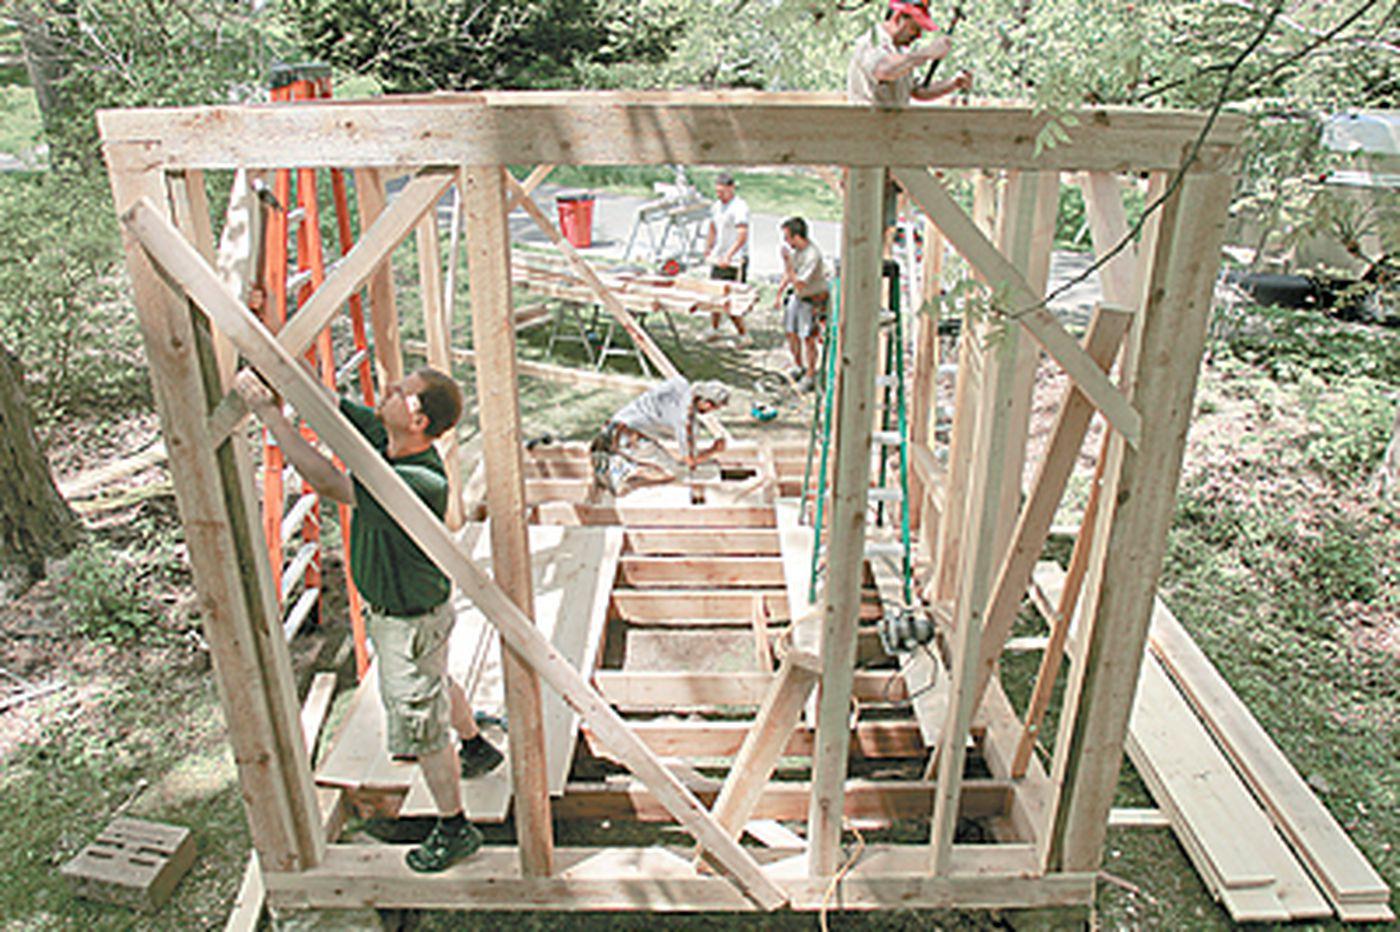 West Chester artisans replicate Thoreau's cabin